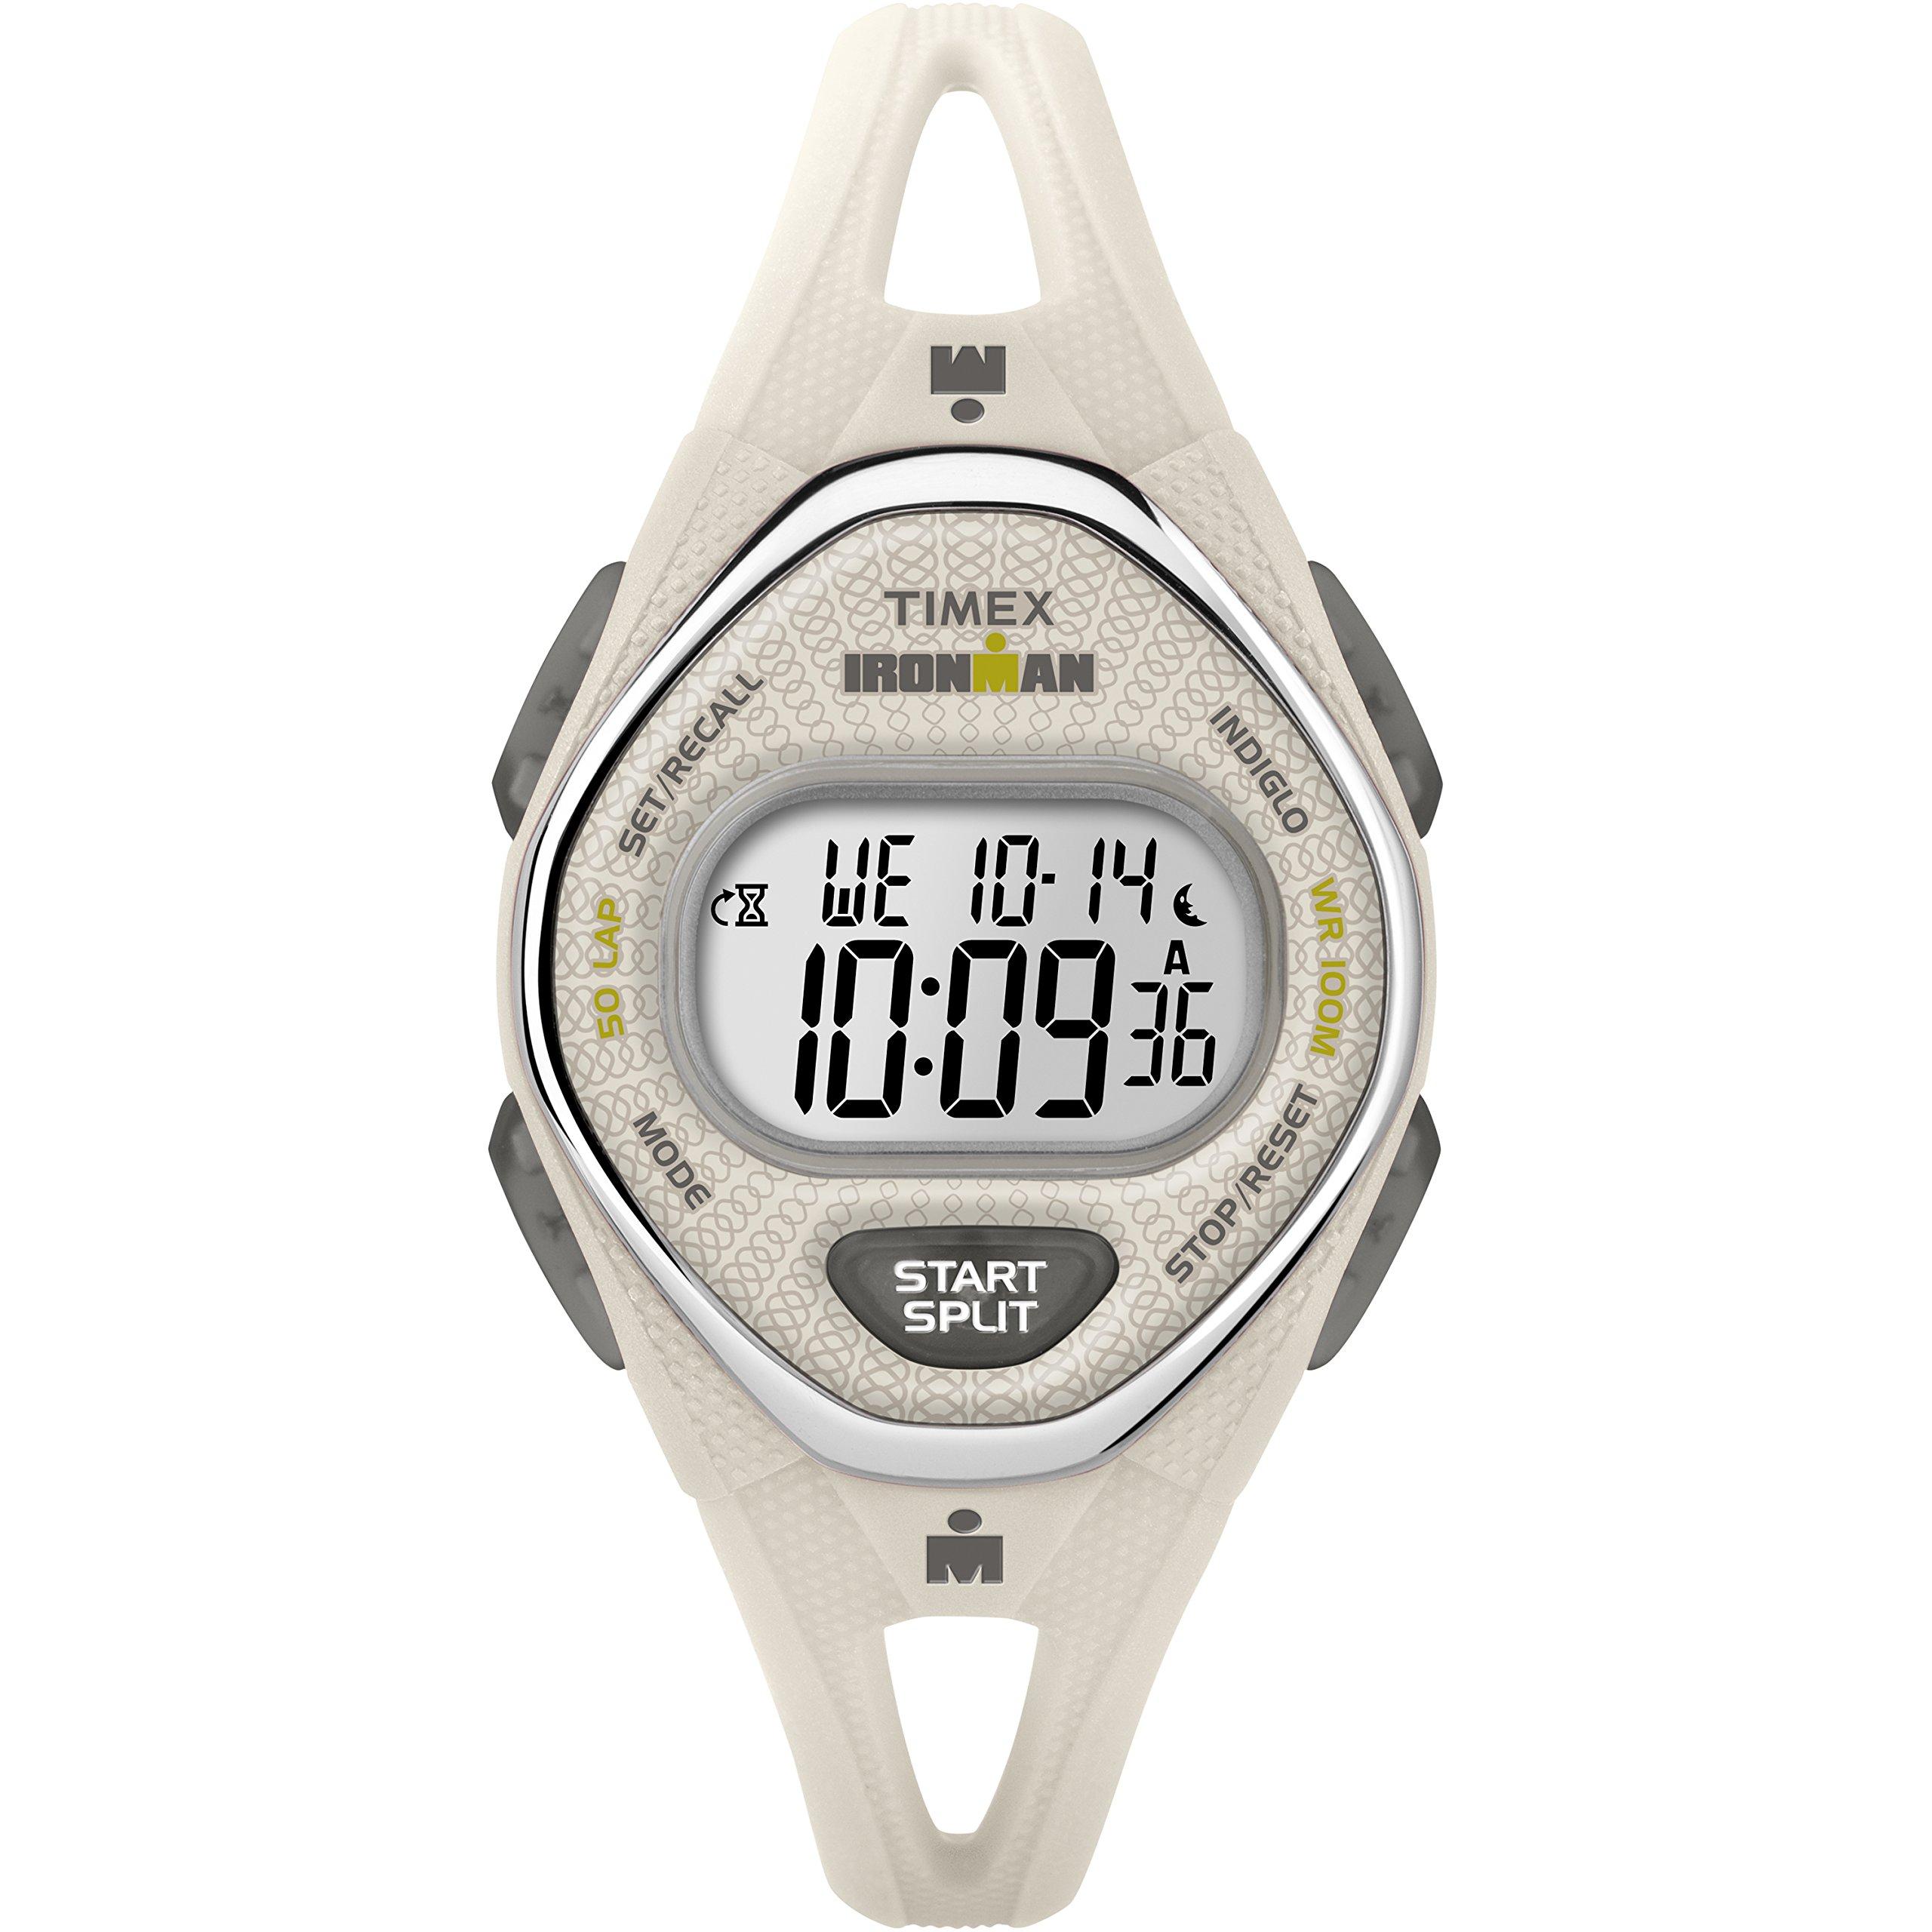 Timex Women's TW5M10800 Ironman Sleek 50 White Silicone Strap Watch by Timex